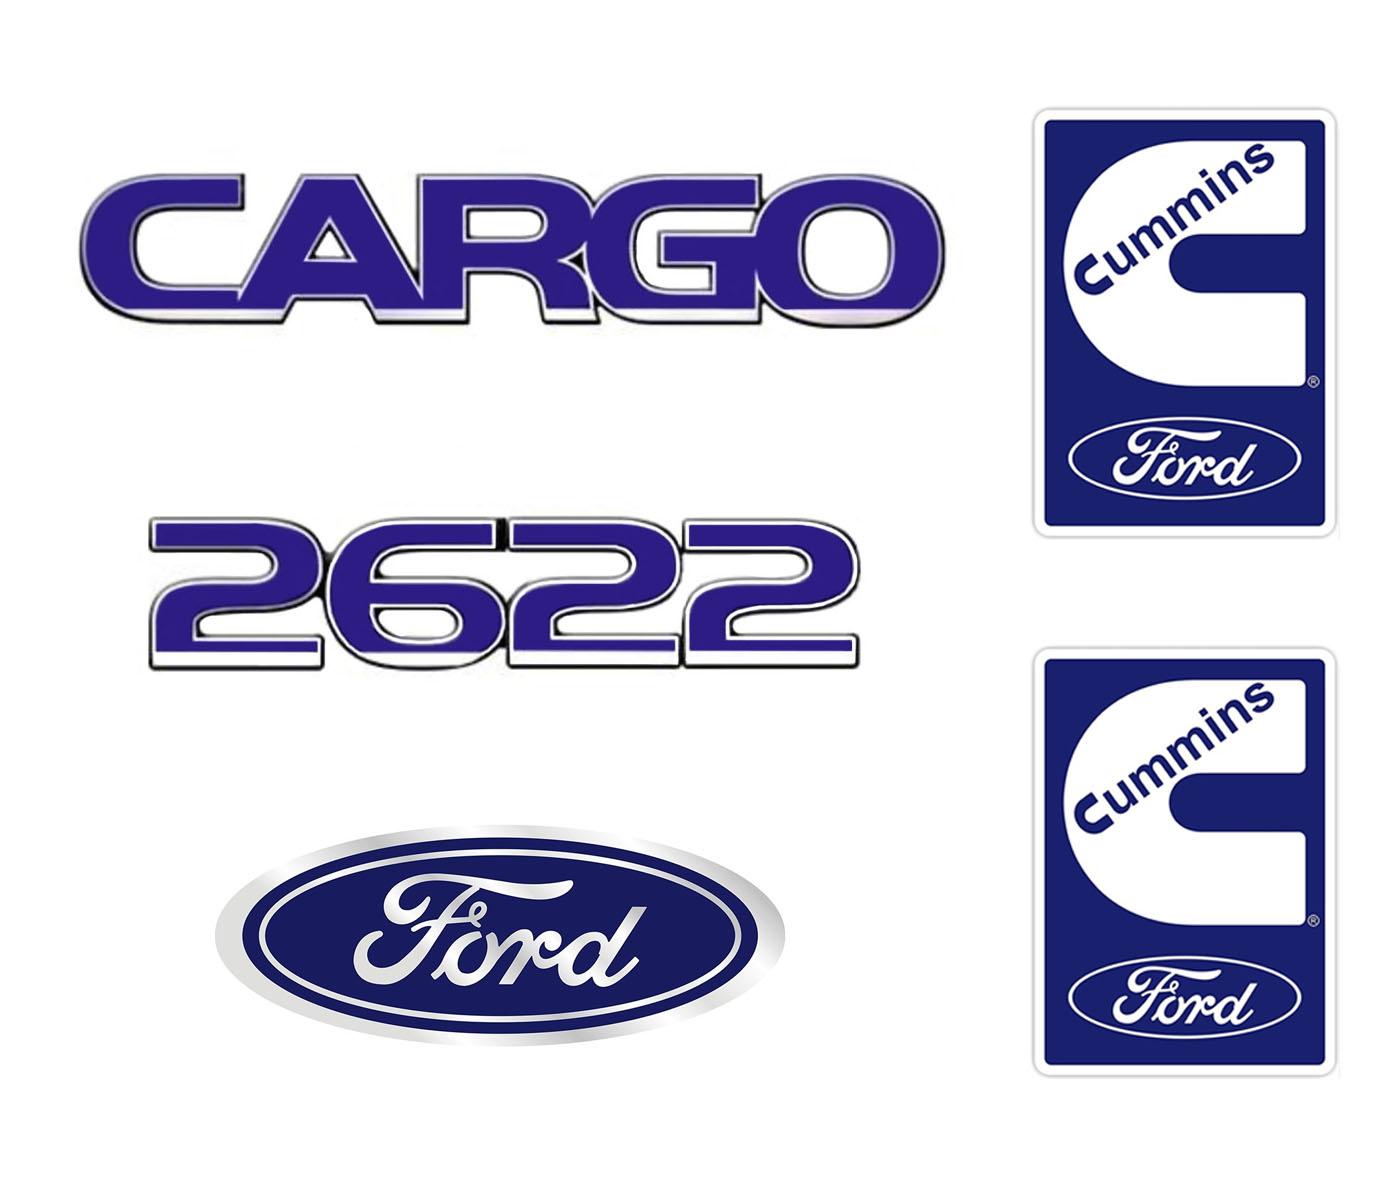 Emblema Ford Cargo 2622 Cummins - Kit